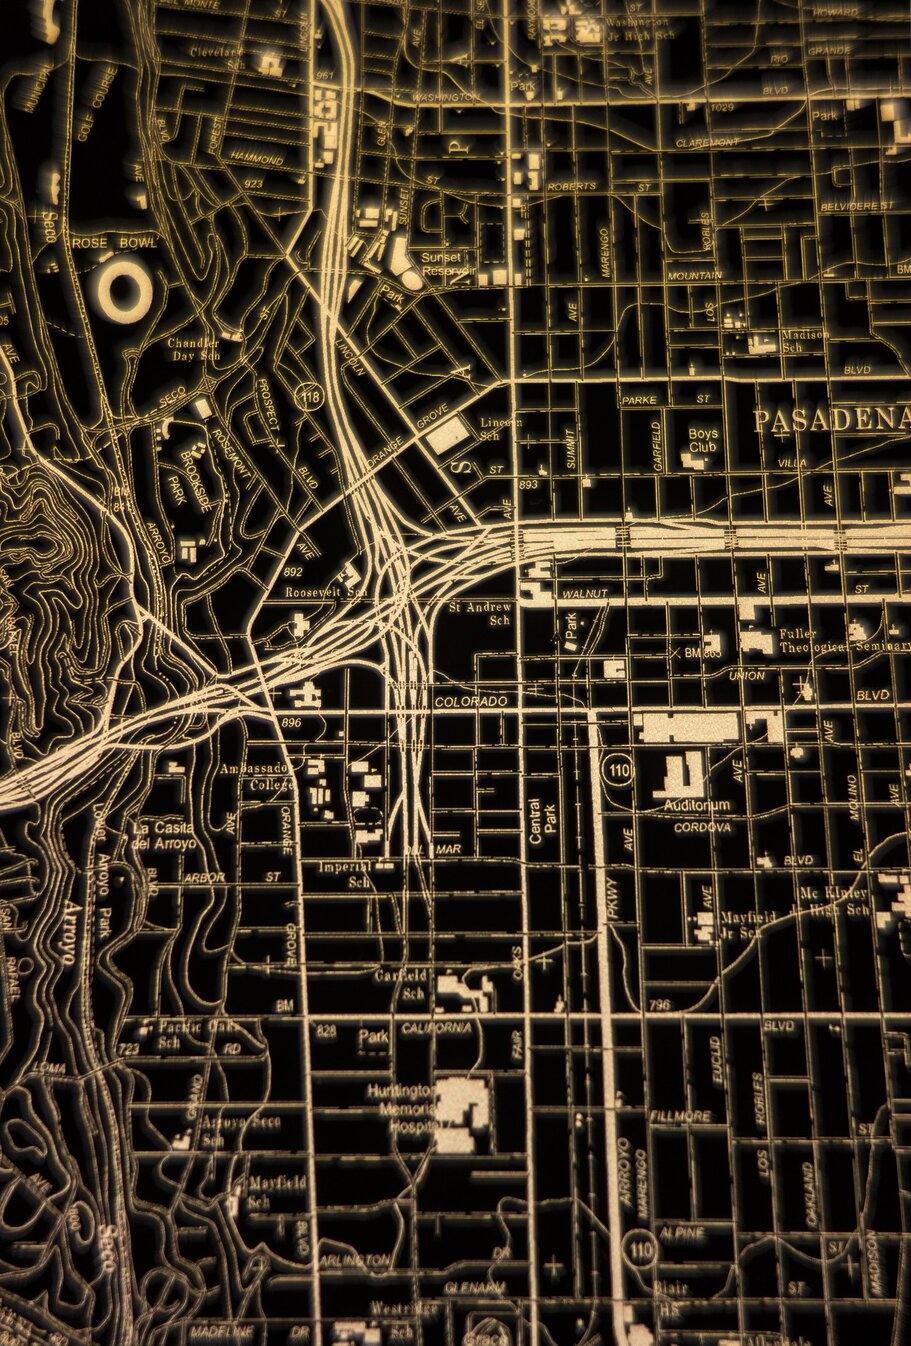 Angeles National Forest illuminated map.